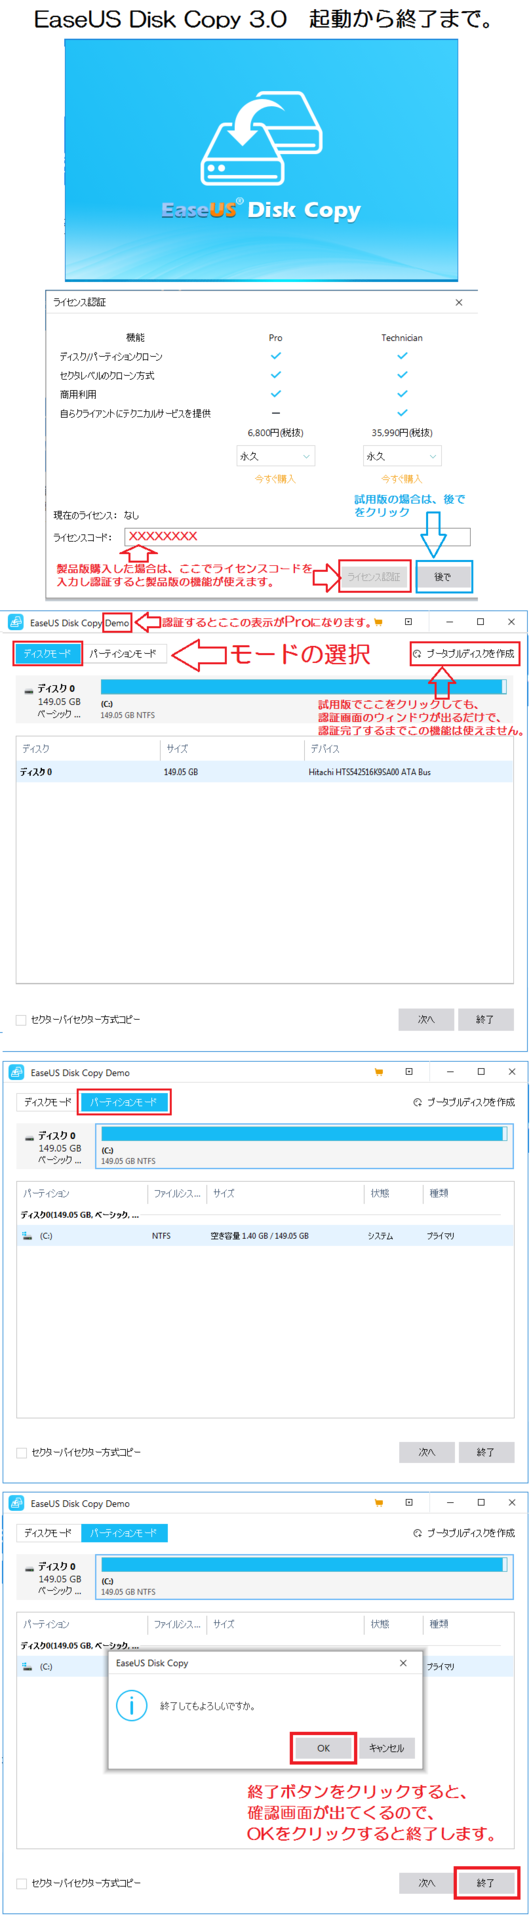 EaseUS Disk Copy Pro 3.0 起動・終了.png